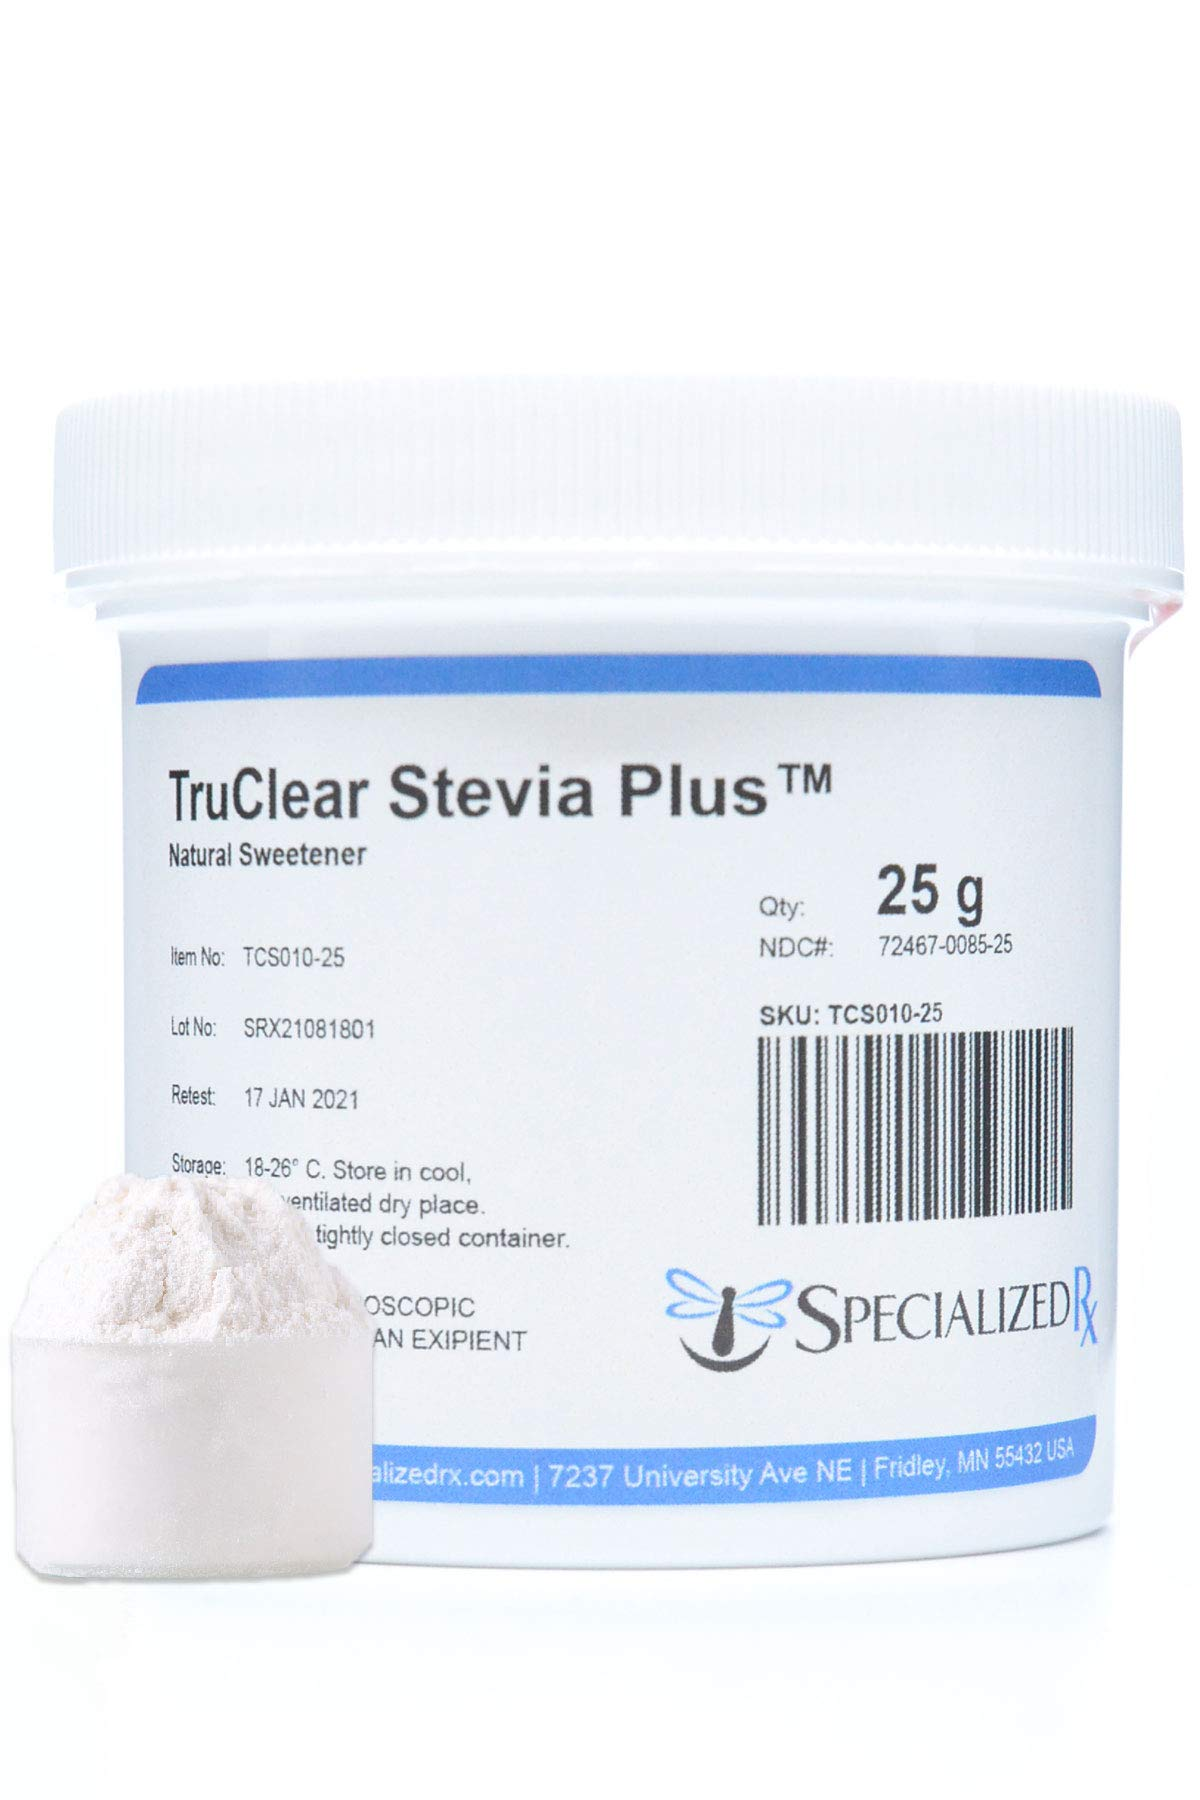 TruClear Stevia Plus Natural Sweetener (500g)